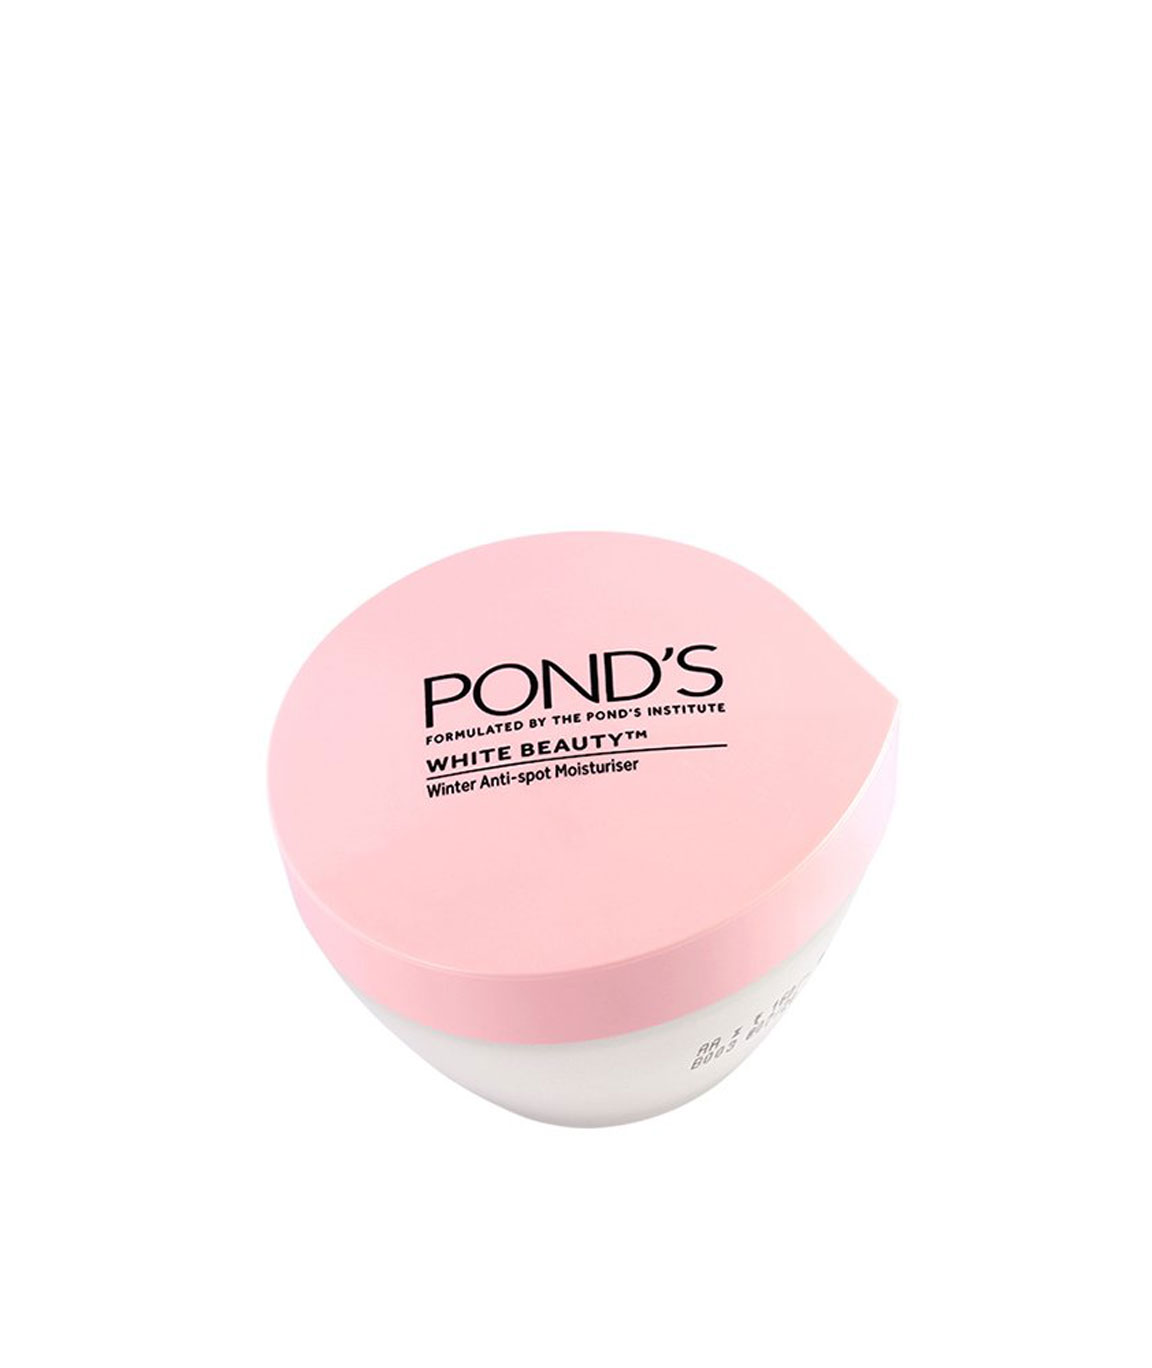 Ponds White Beauty Intense Moisture Spot-Less,Day cream,35gm